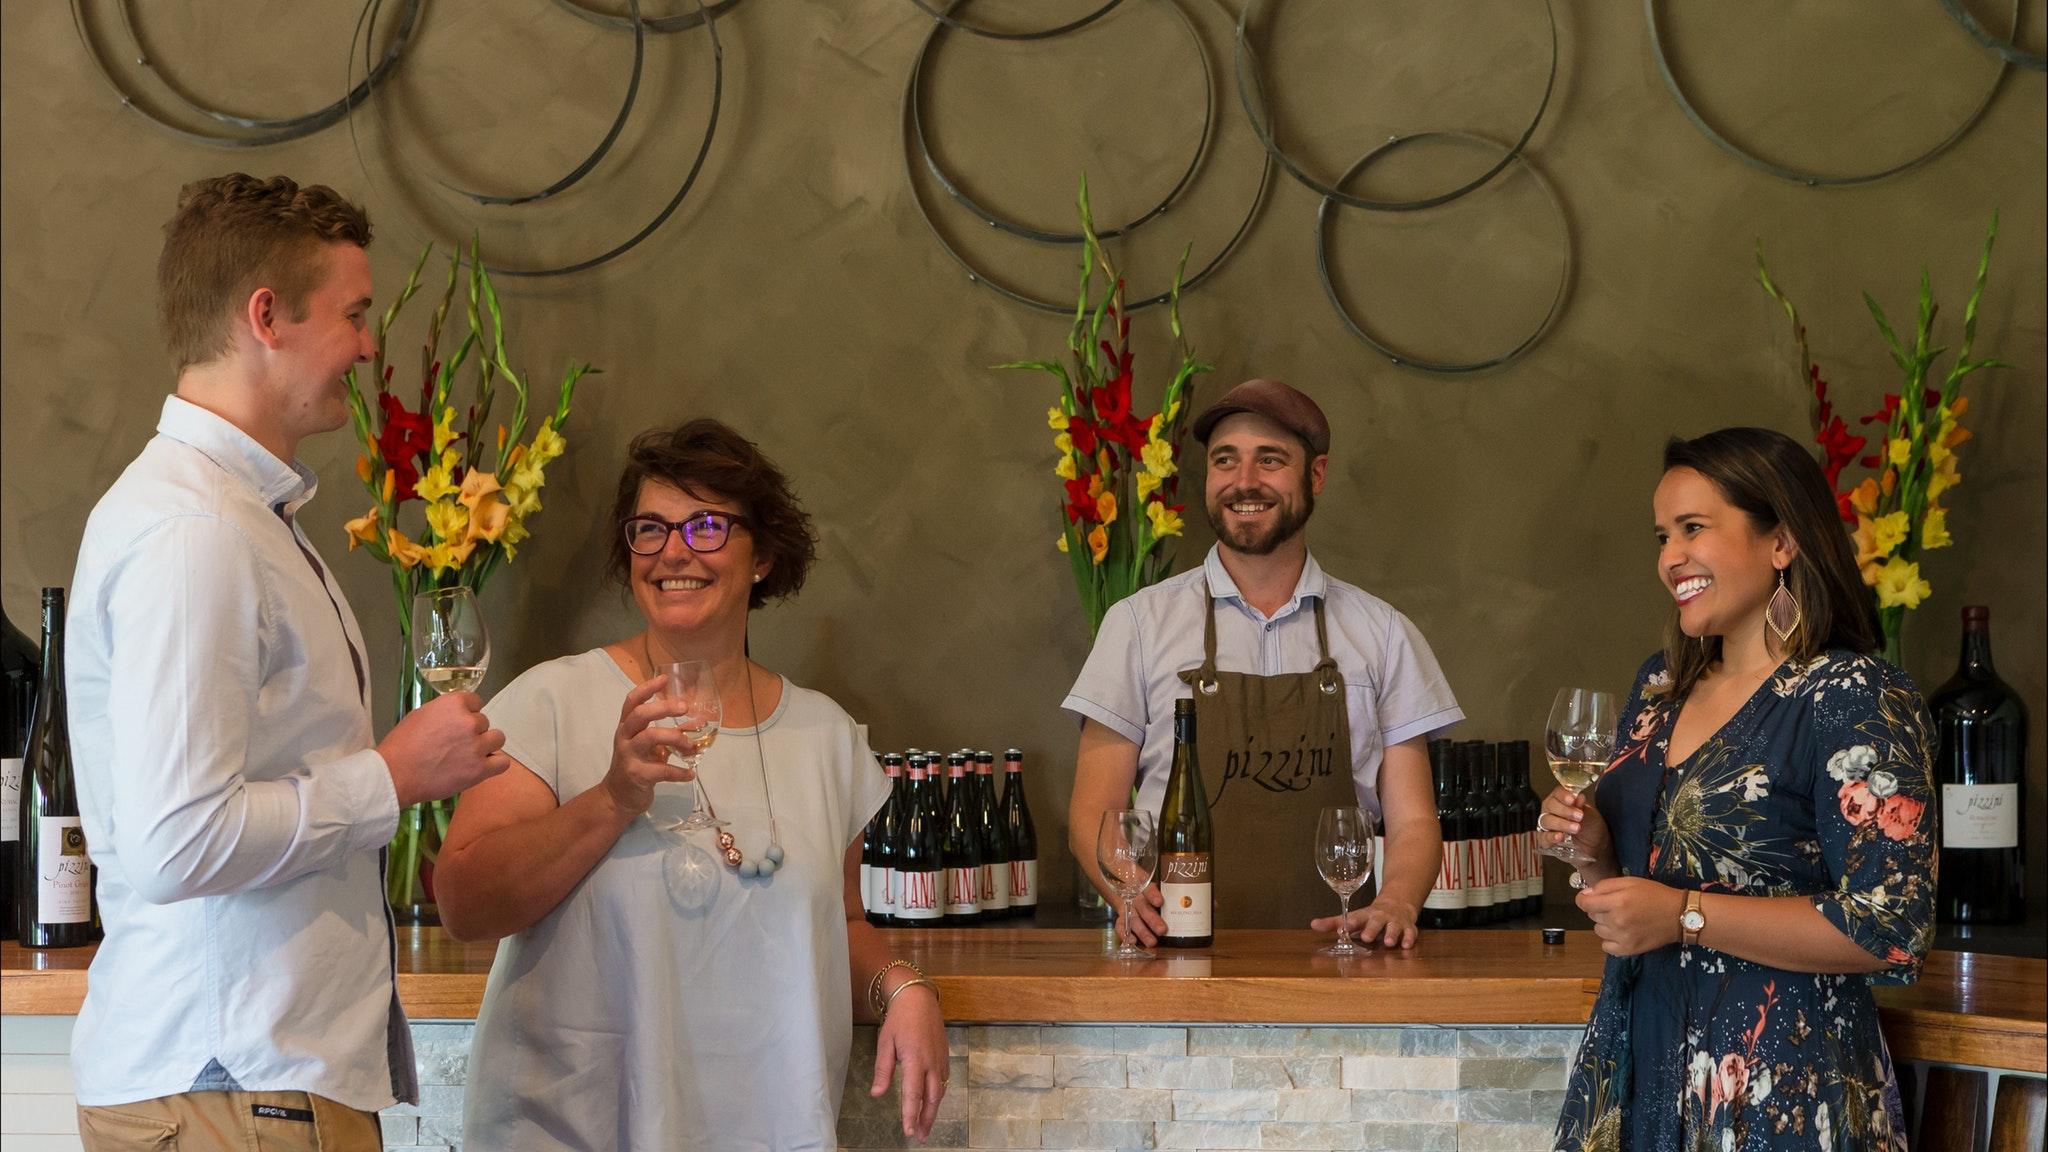 Wine Tasting at Pizzini Cellar Door